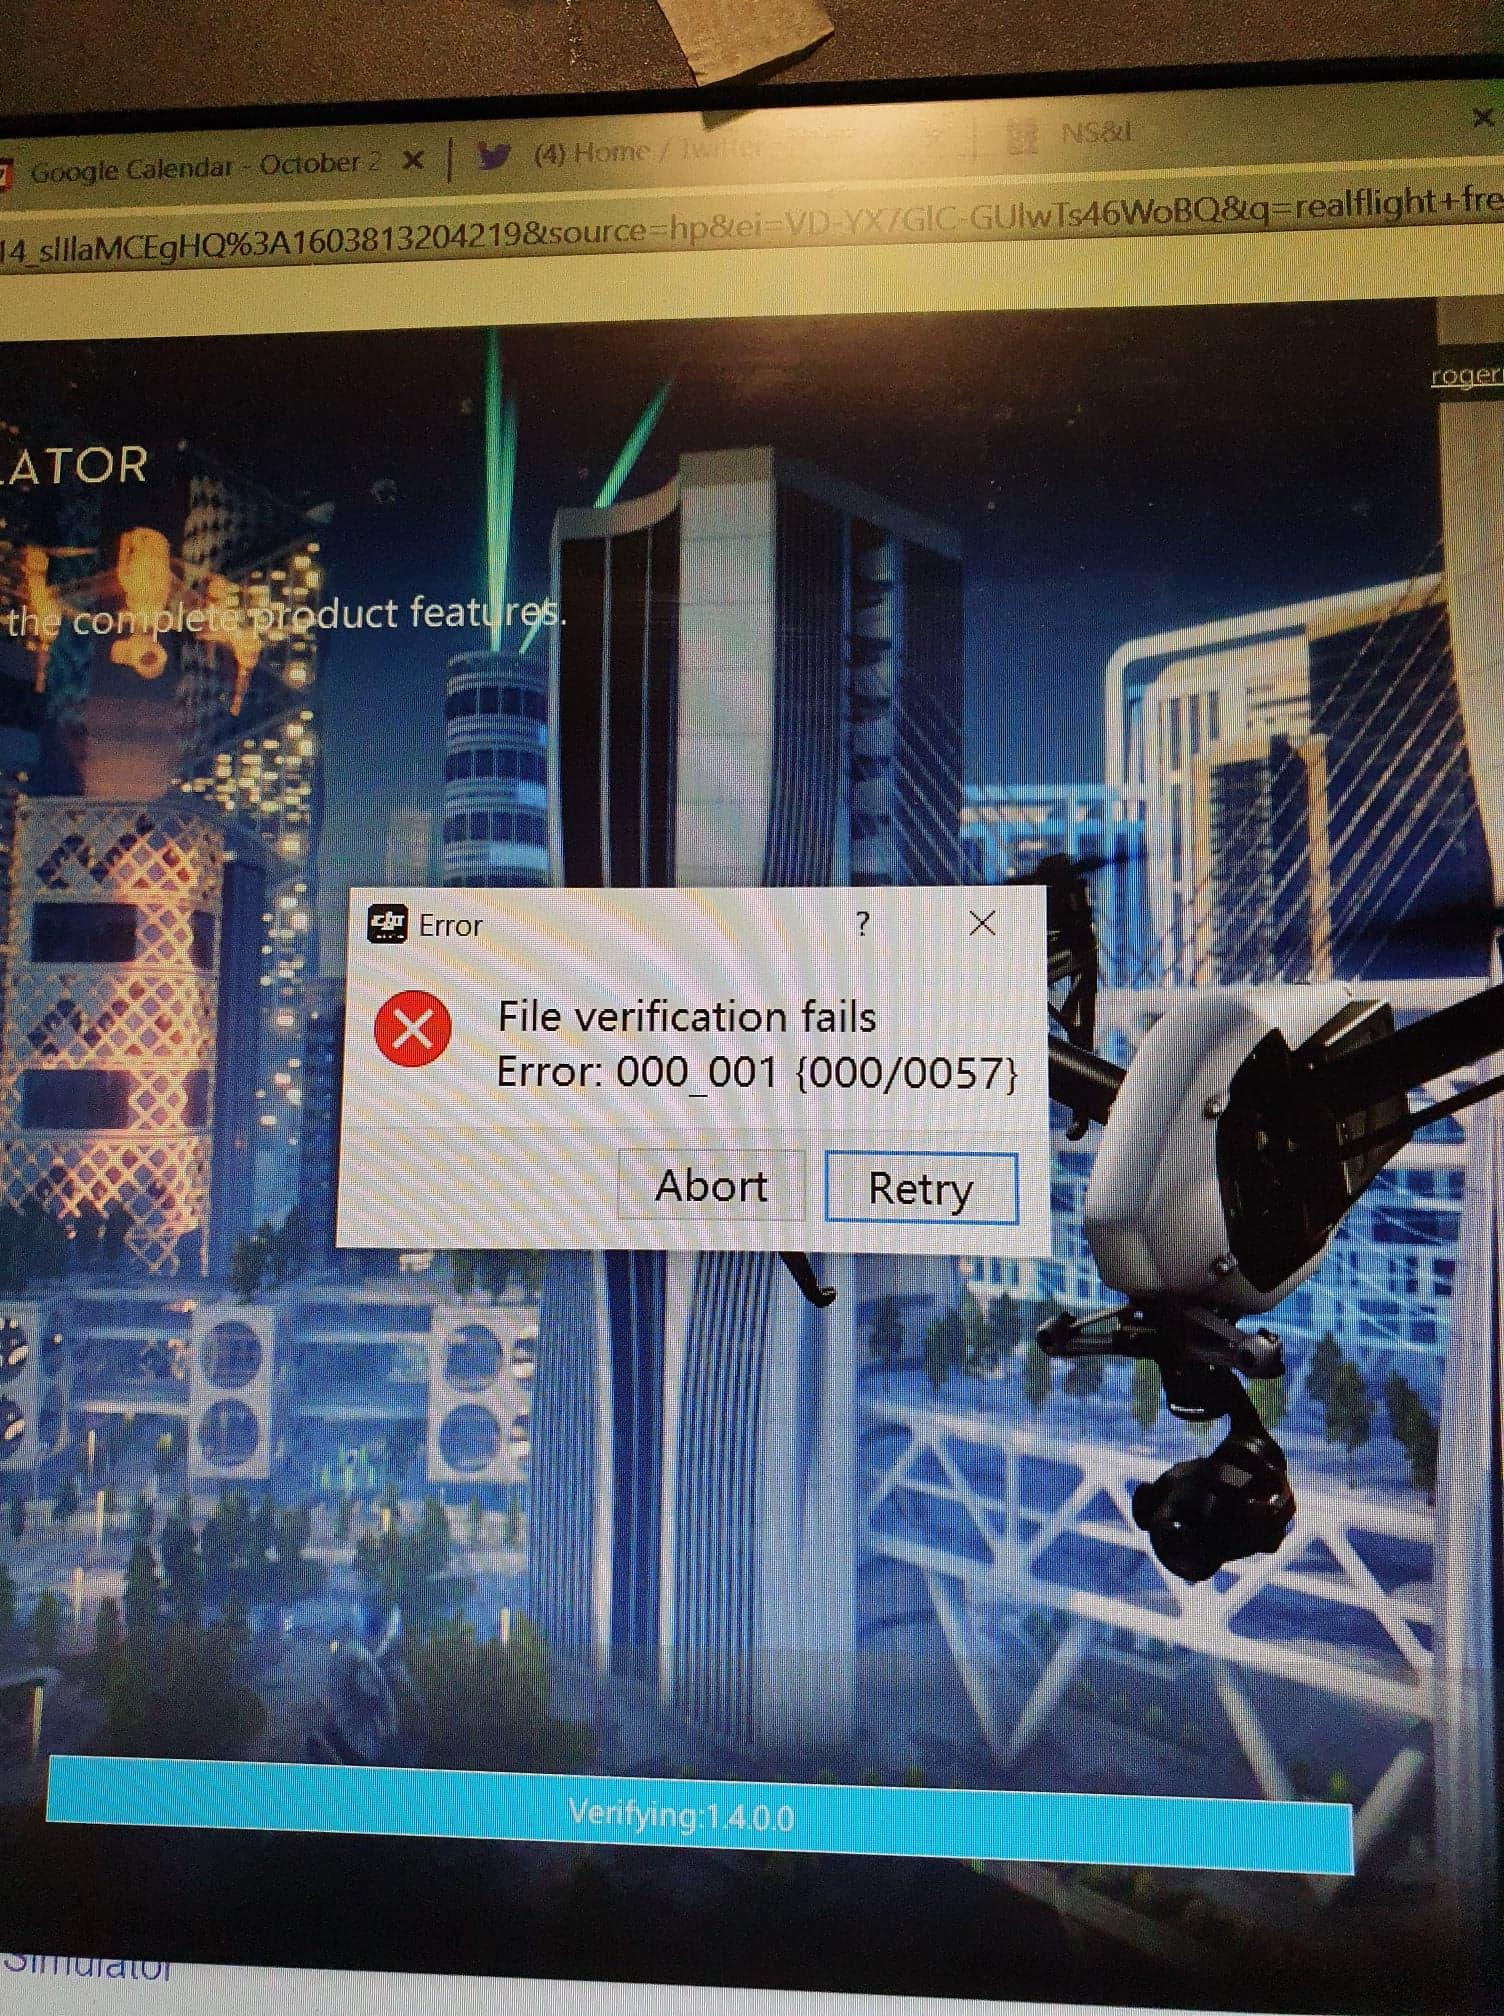 Screenshot of error code